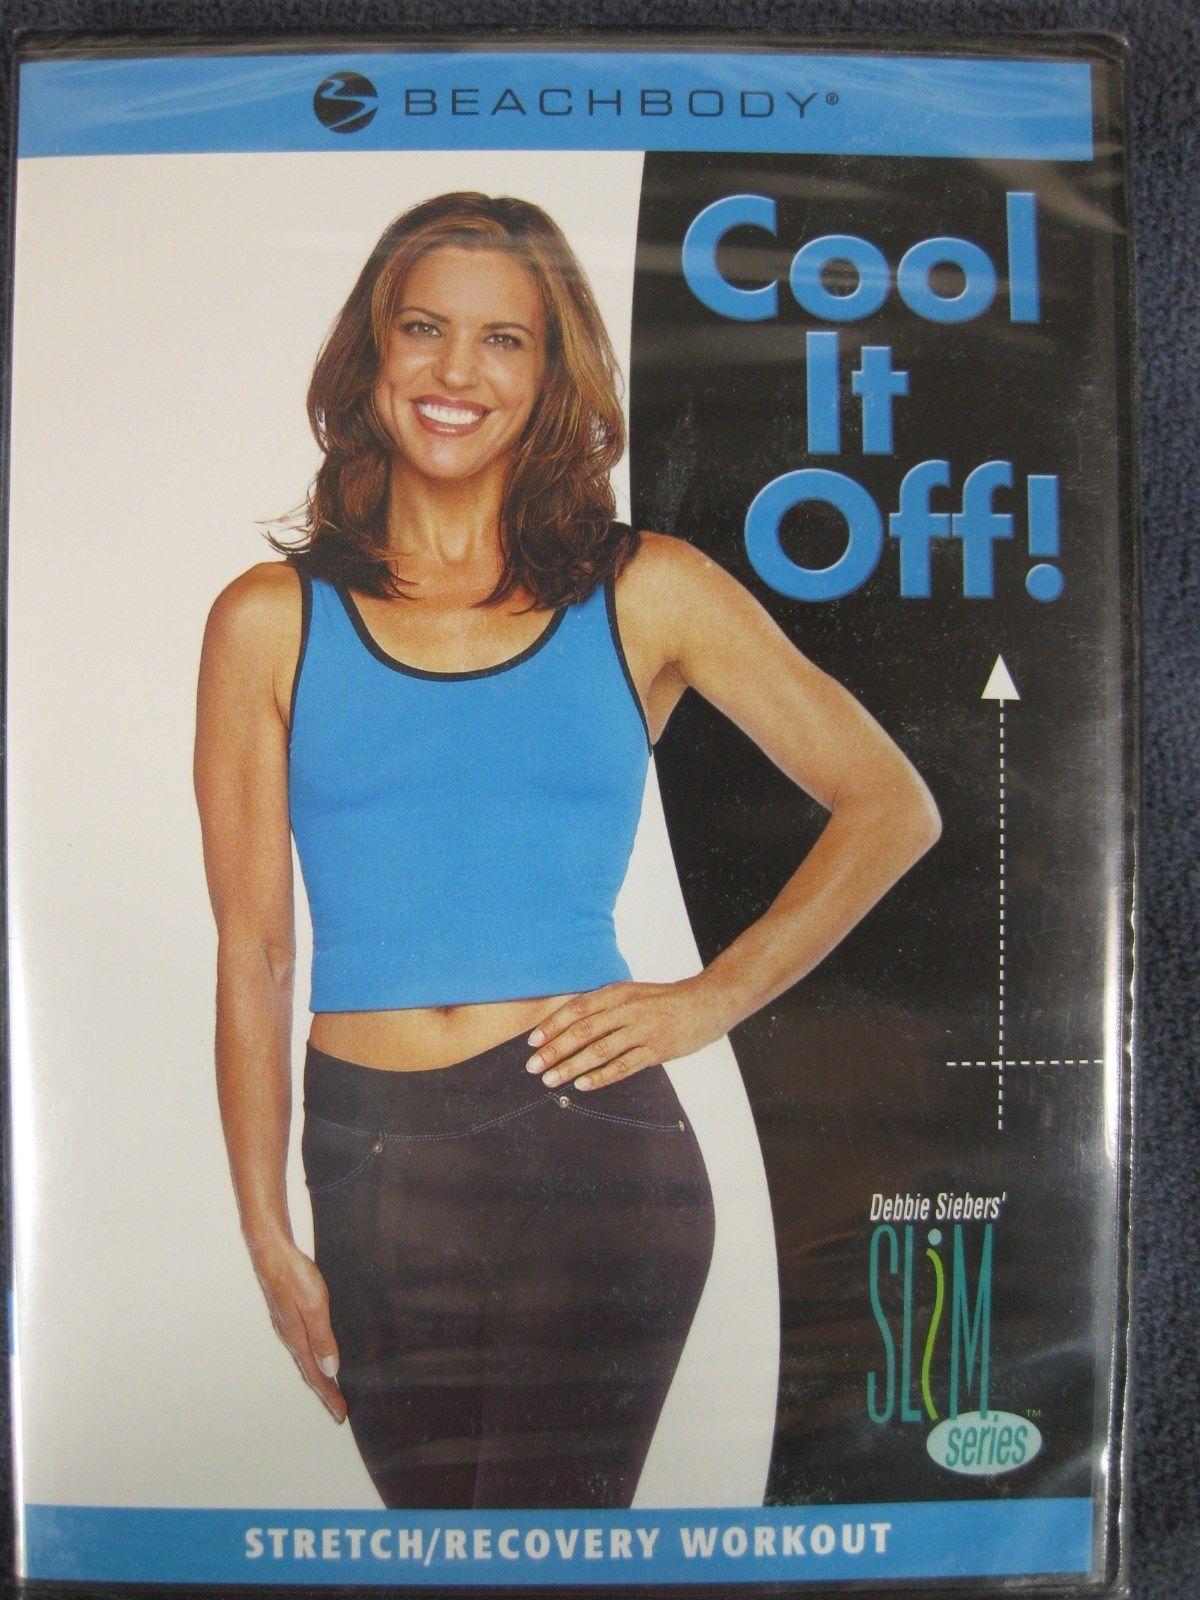 Debbie Siebers Slim in 6 Cool It Off Beachbody DVD Stretch Recovery New Sealed